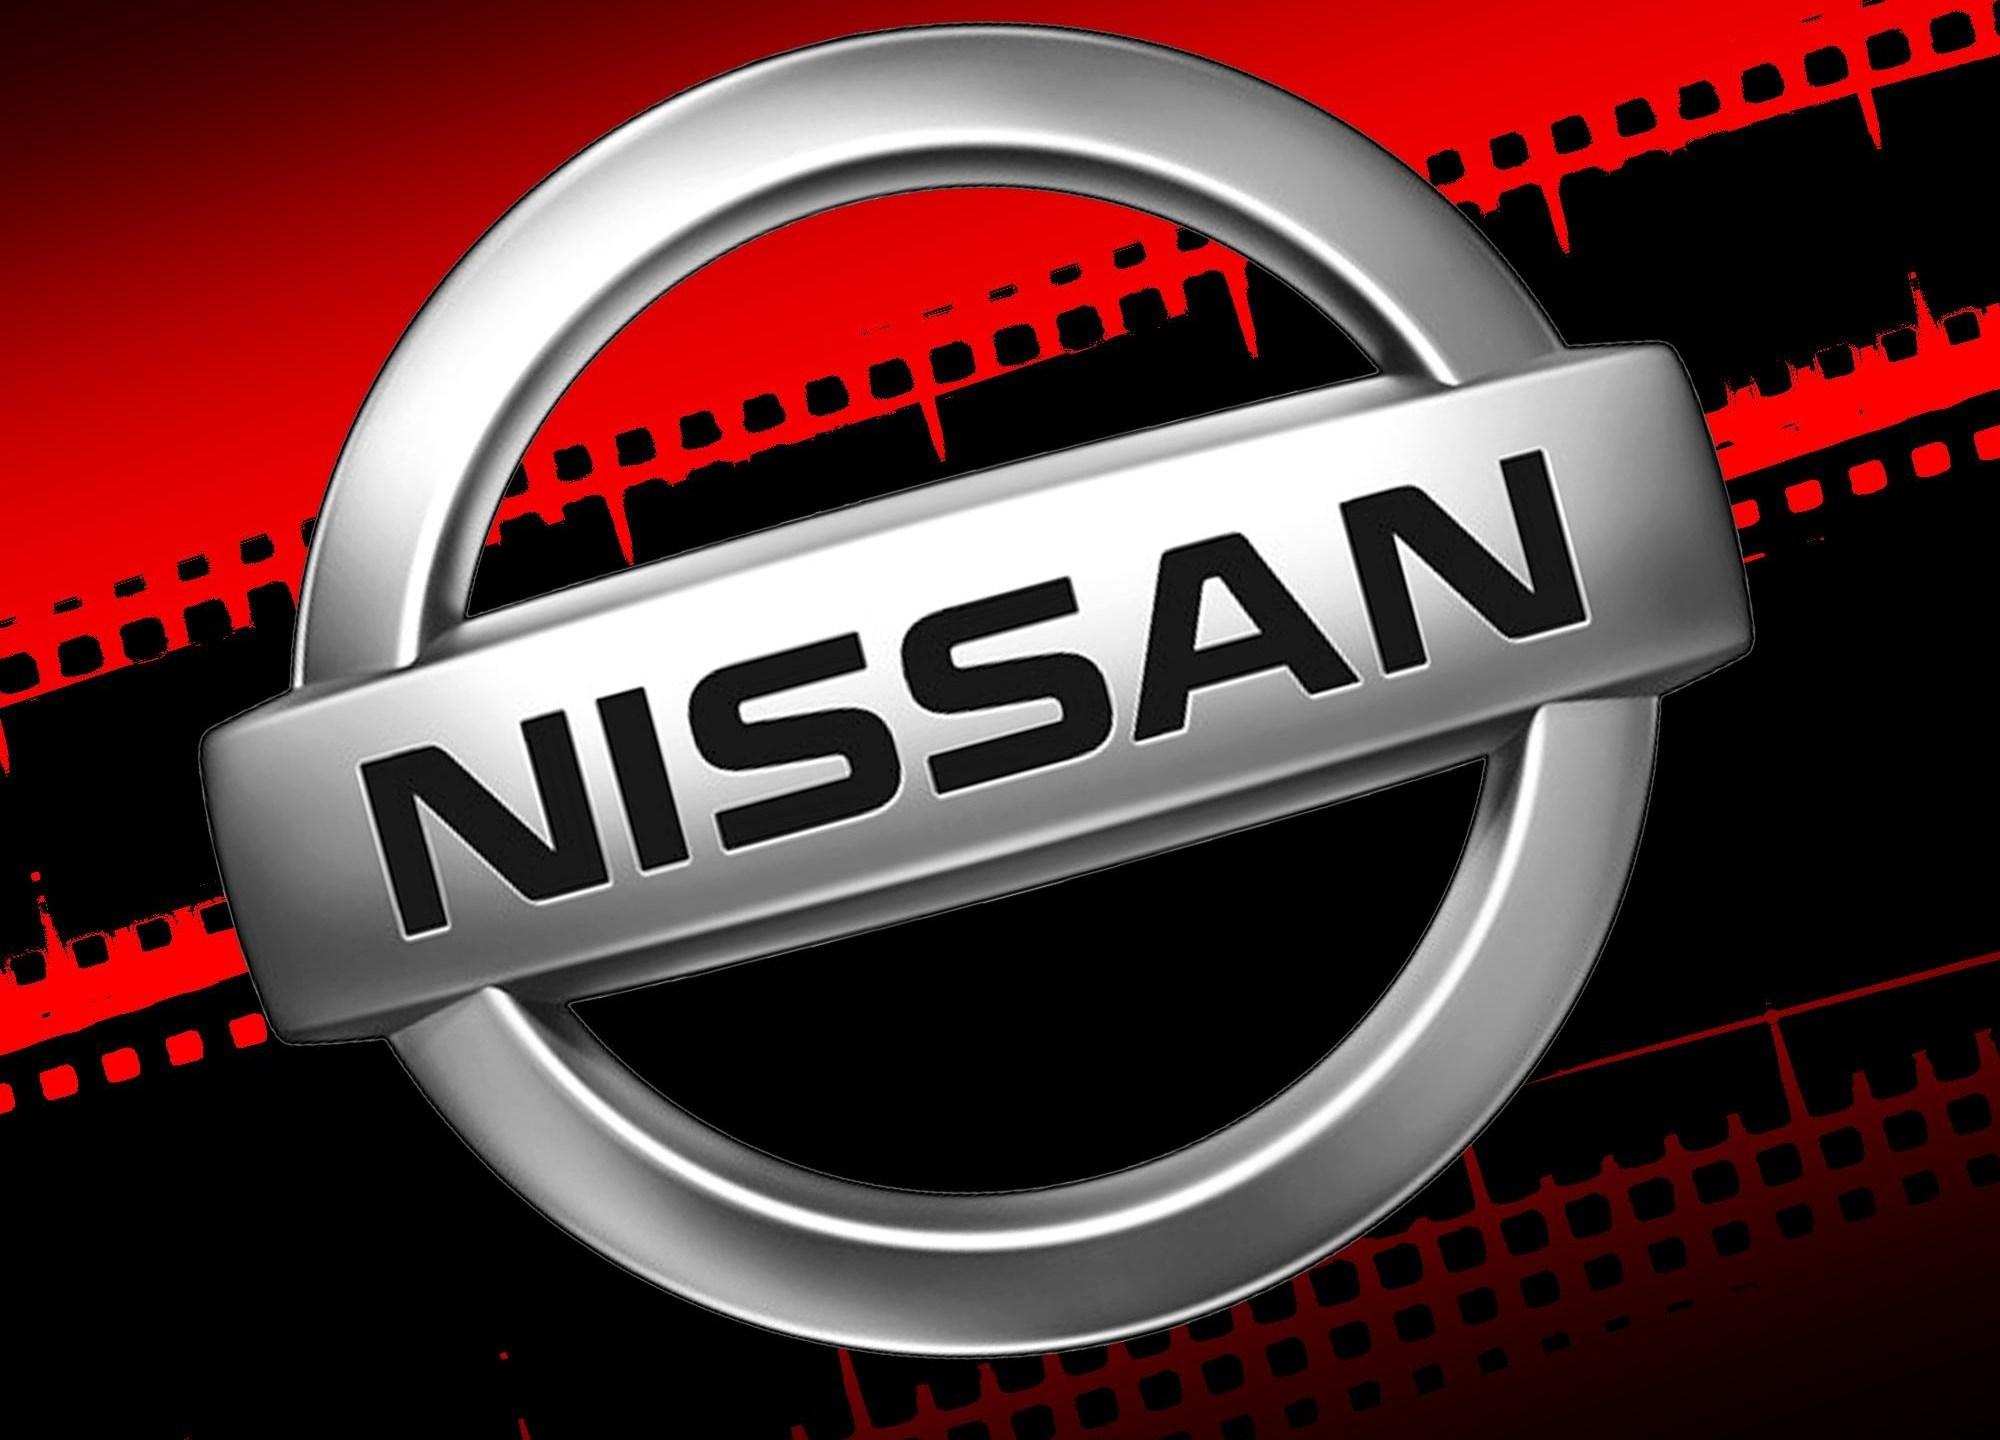 Nissan AP_166600